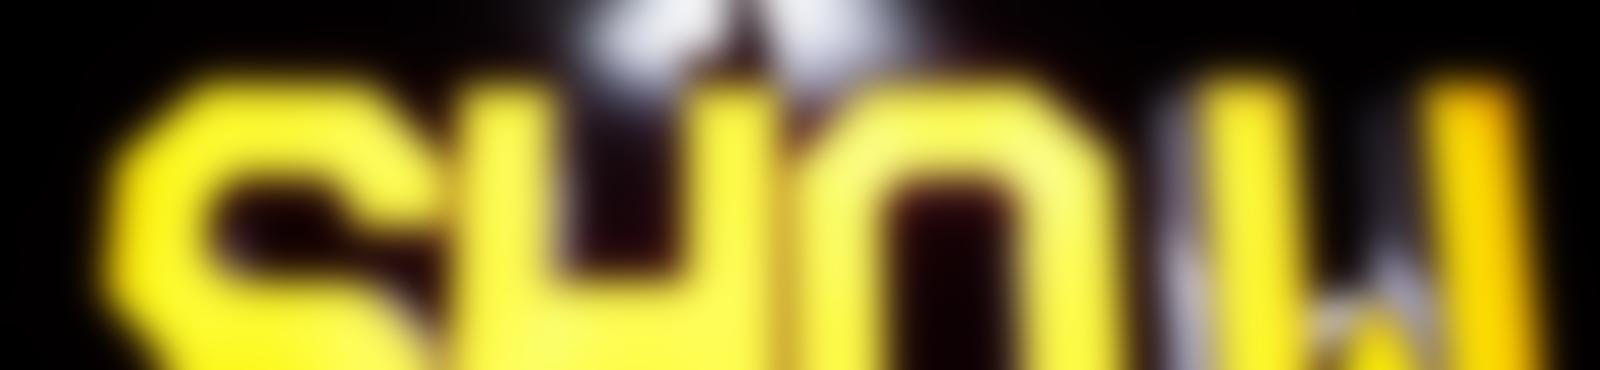 Blurred 16b1a883 889c 4cc1 850e 04ff2ad44eac